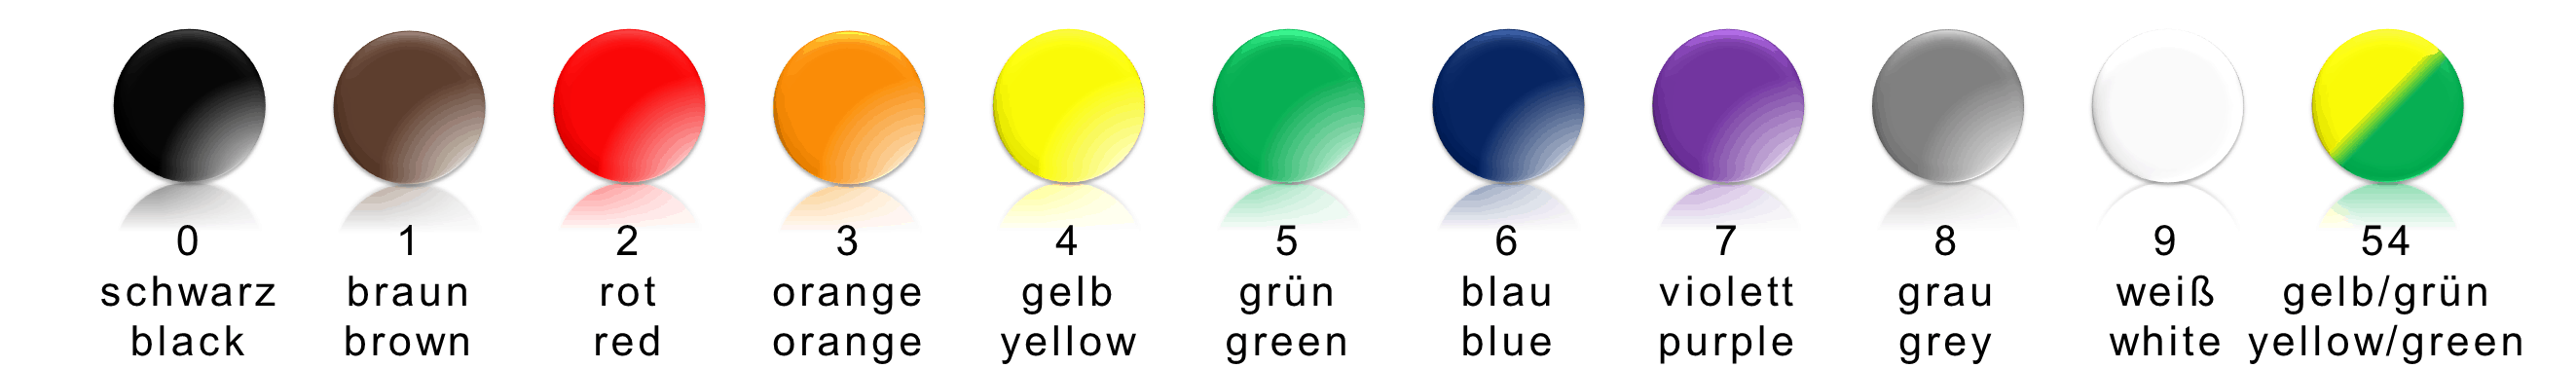 Hauptfarbcode - MIL-STD-681